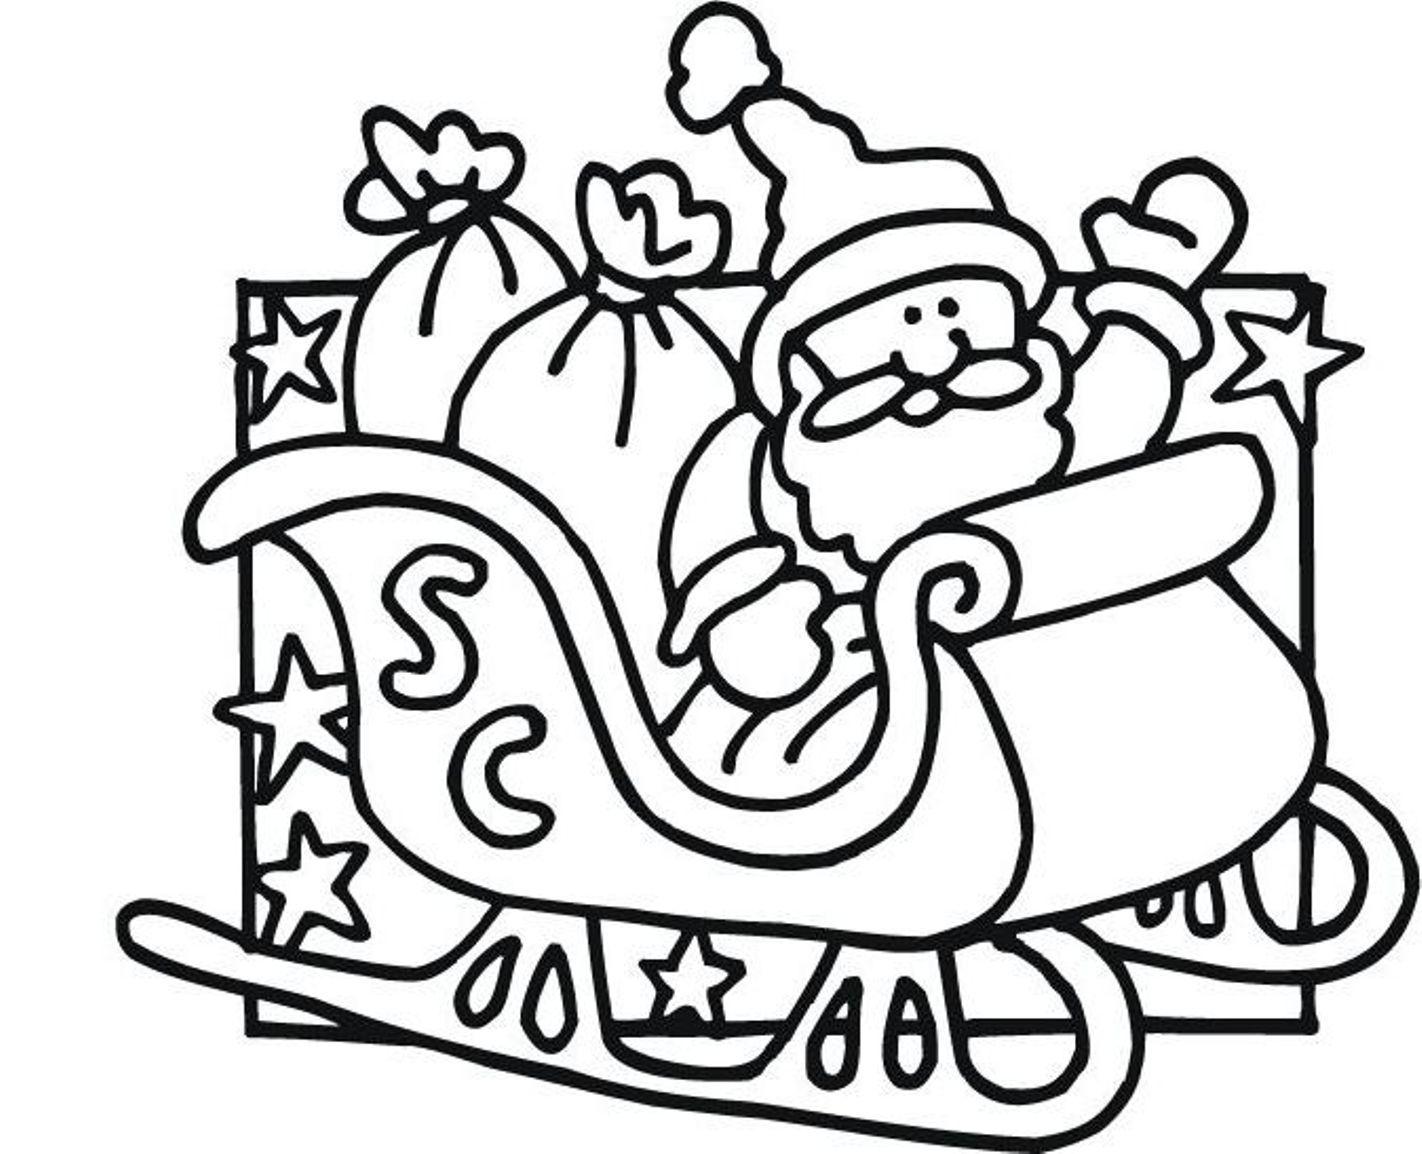 Santa Claus Coloring Pages Free Printables At Getcolorings